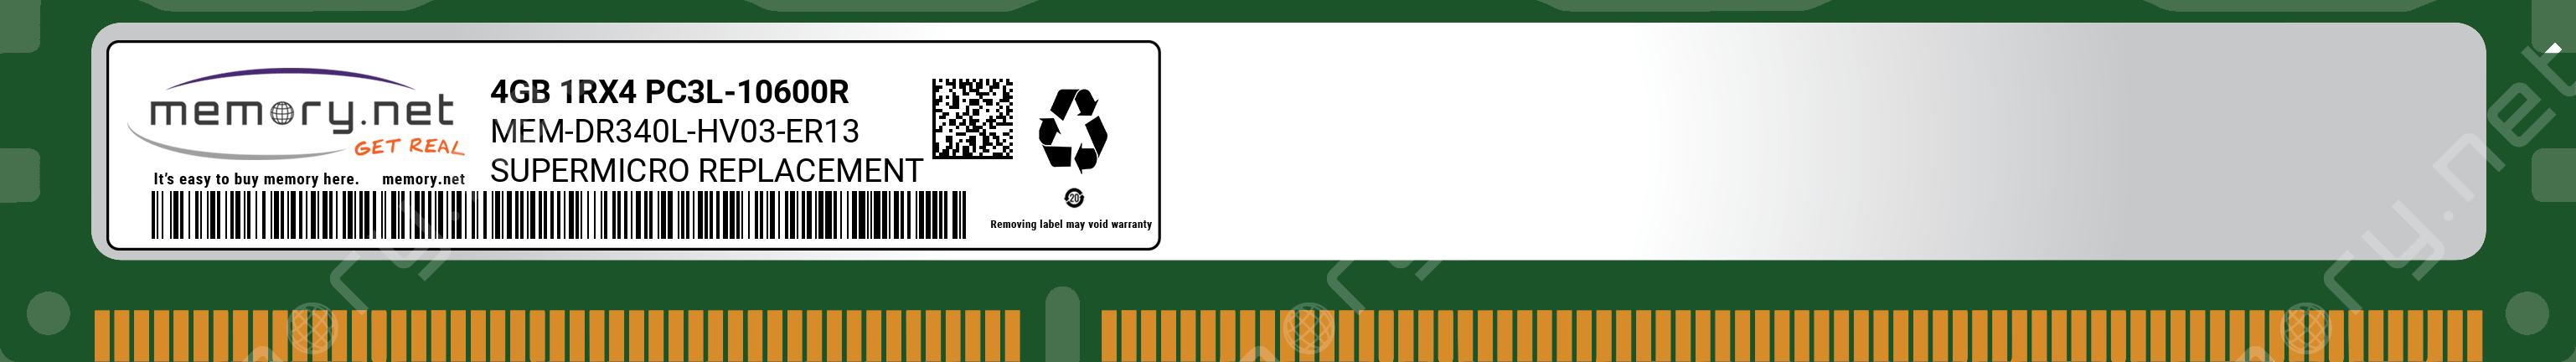 MEM-DR340L-HV03-ER13